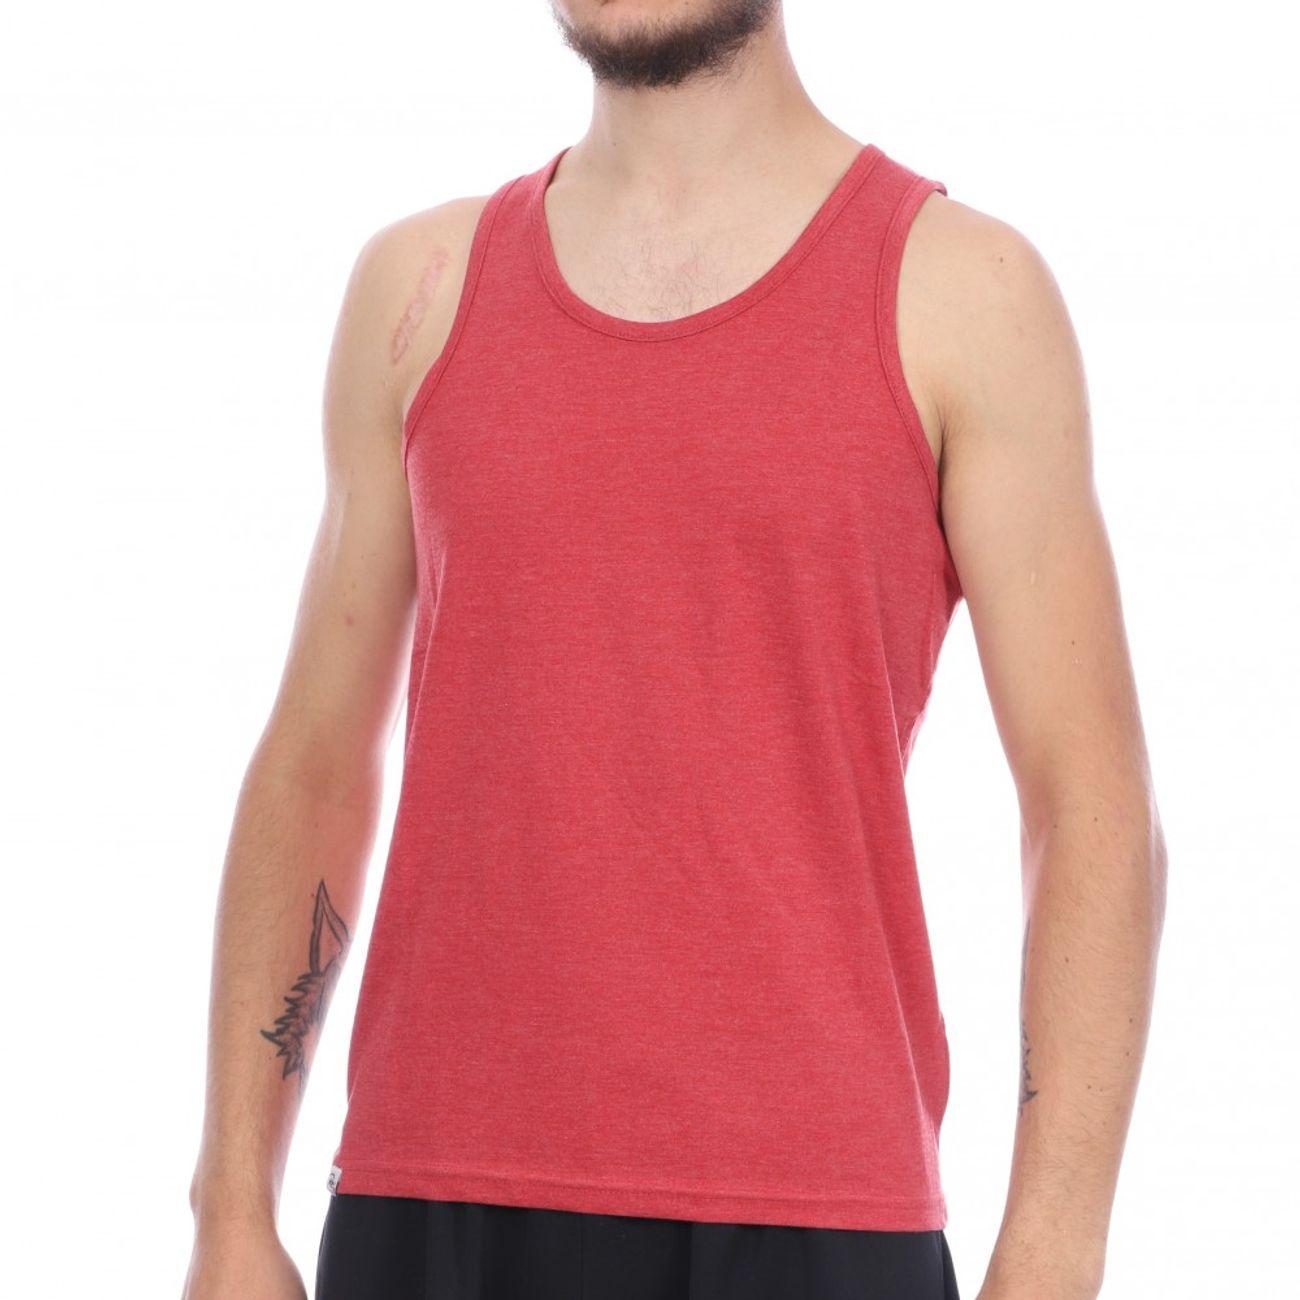 Mode- Lifestyle homme RMS26 Débardeur Rouge Chiné Homme RMS 26